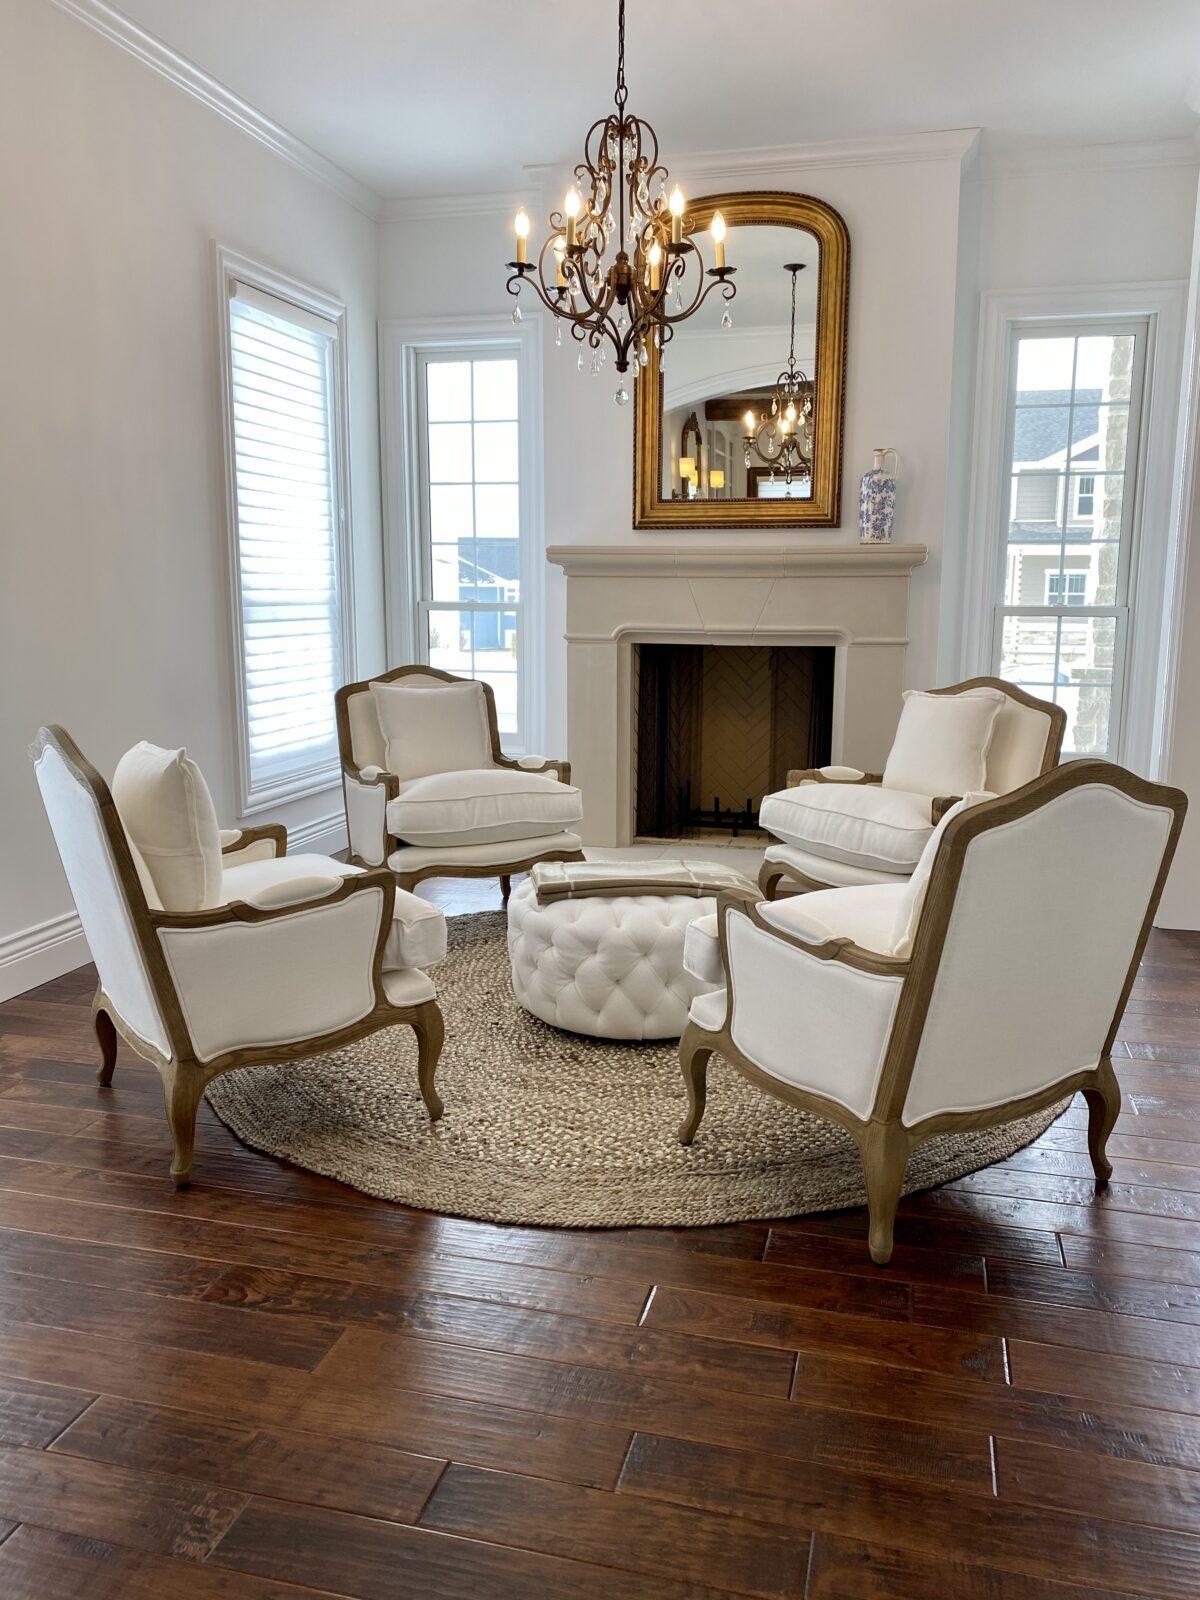 Living room flooring   H&R Carpets and Flooring